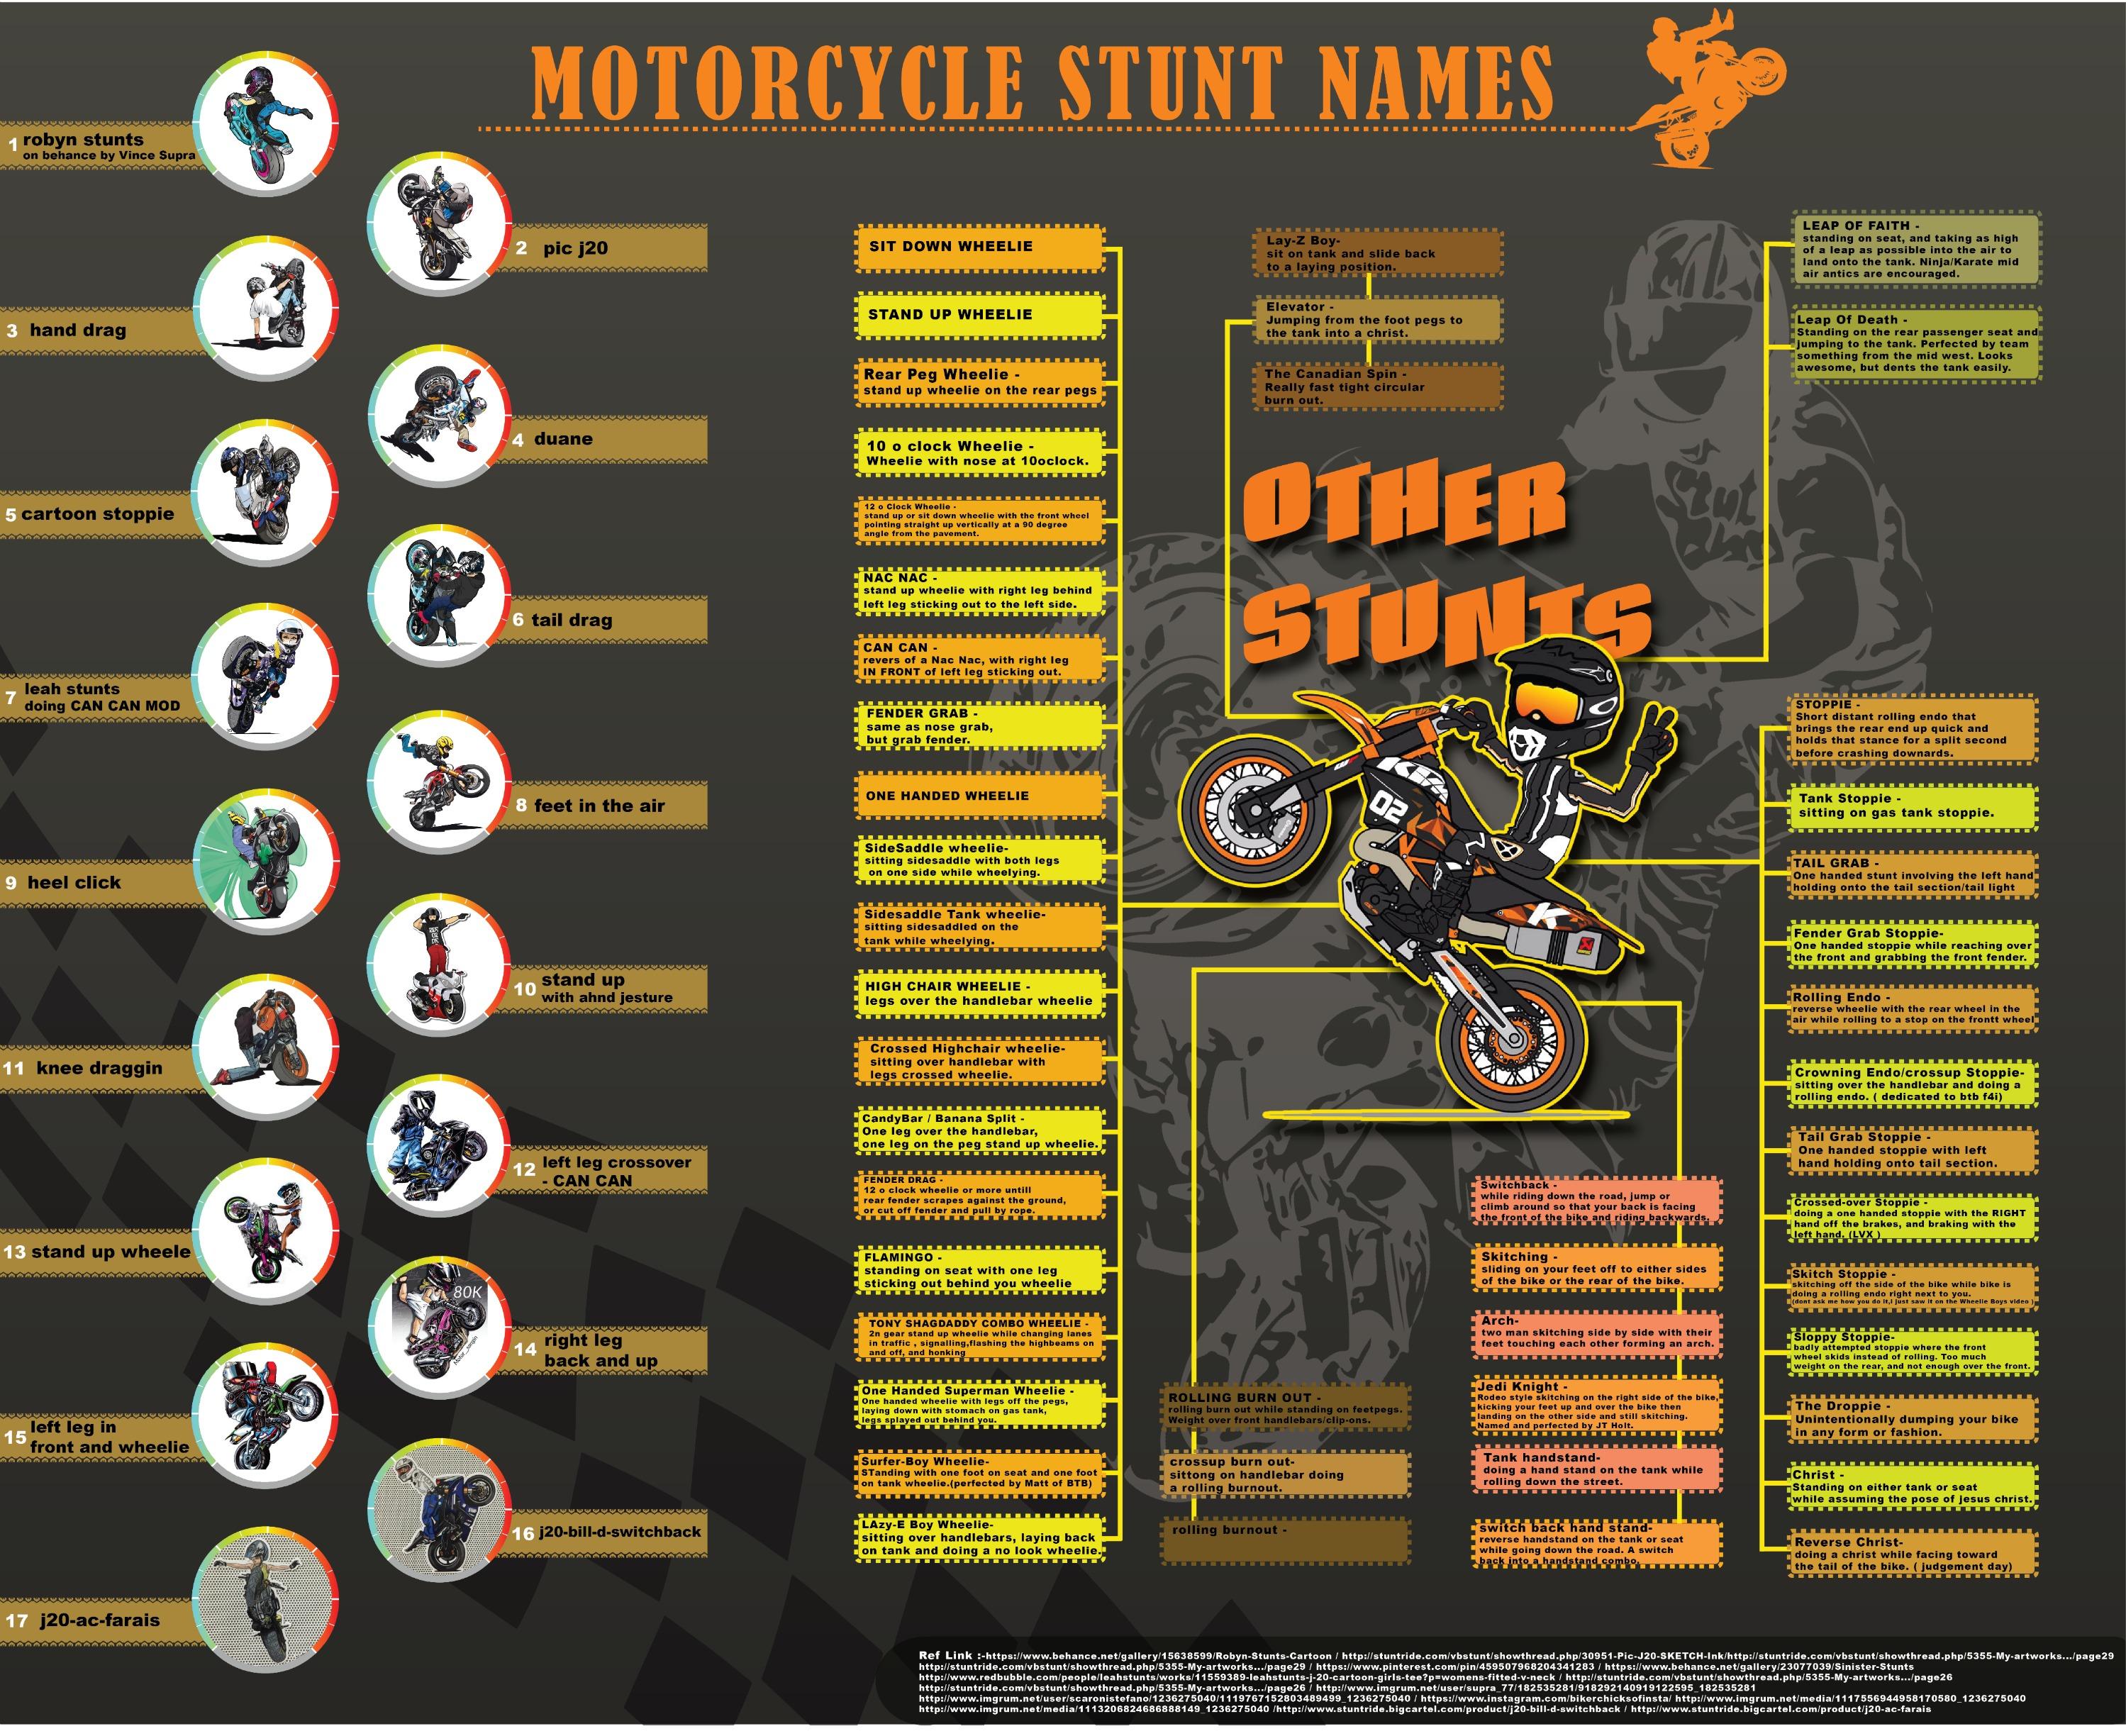 Motorcycle Stunt Names